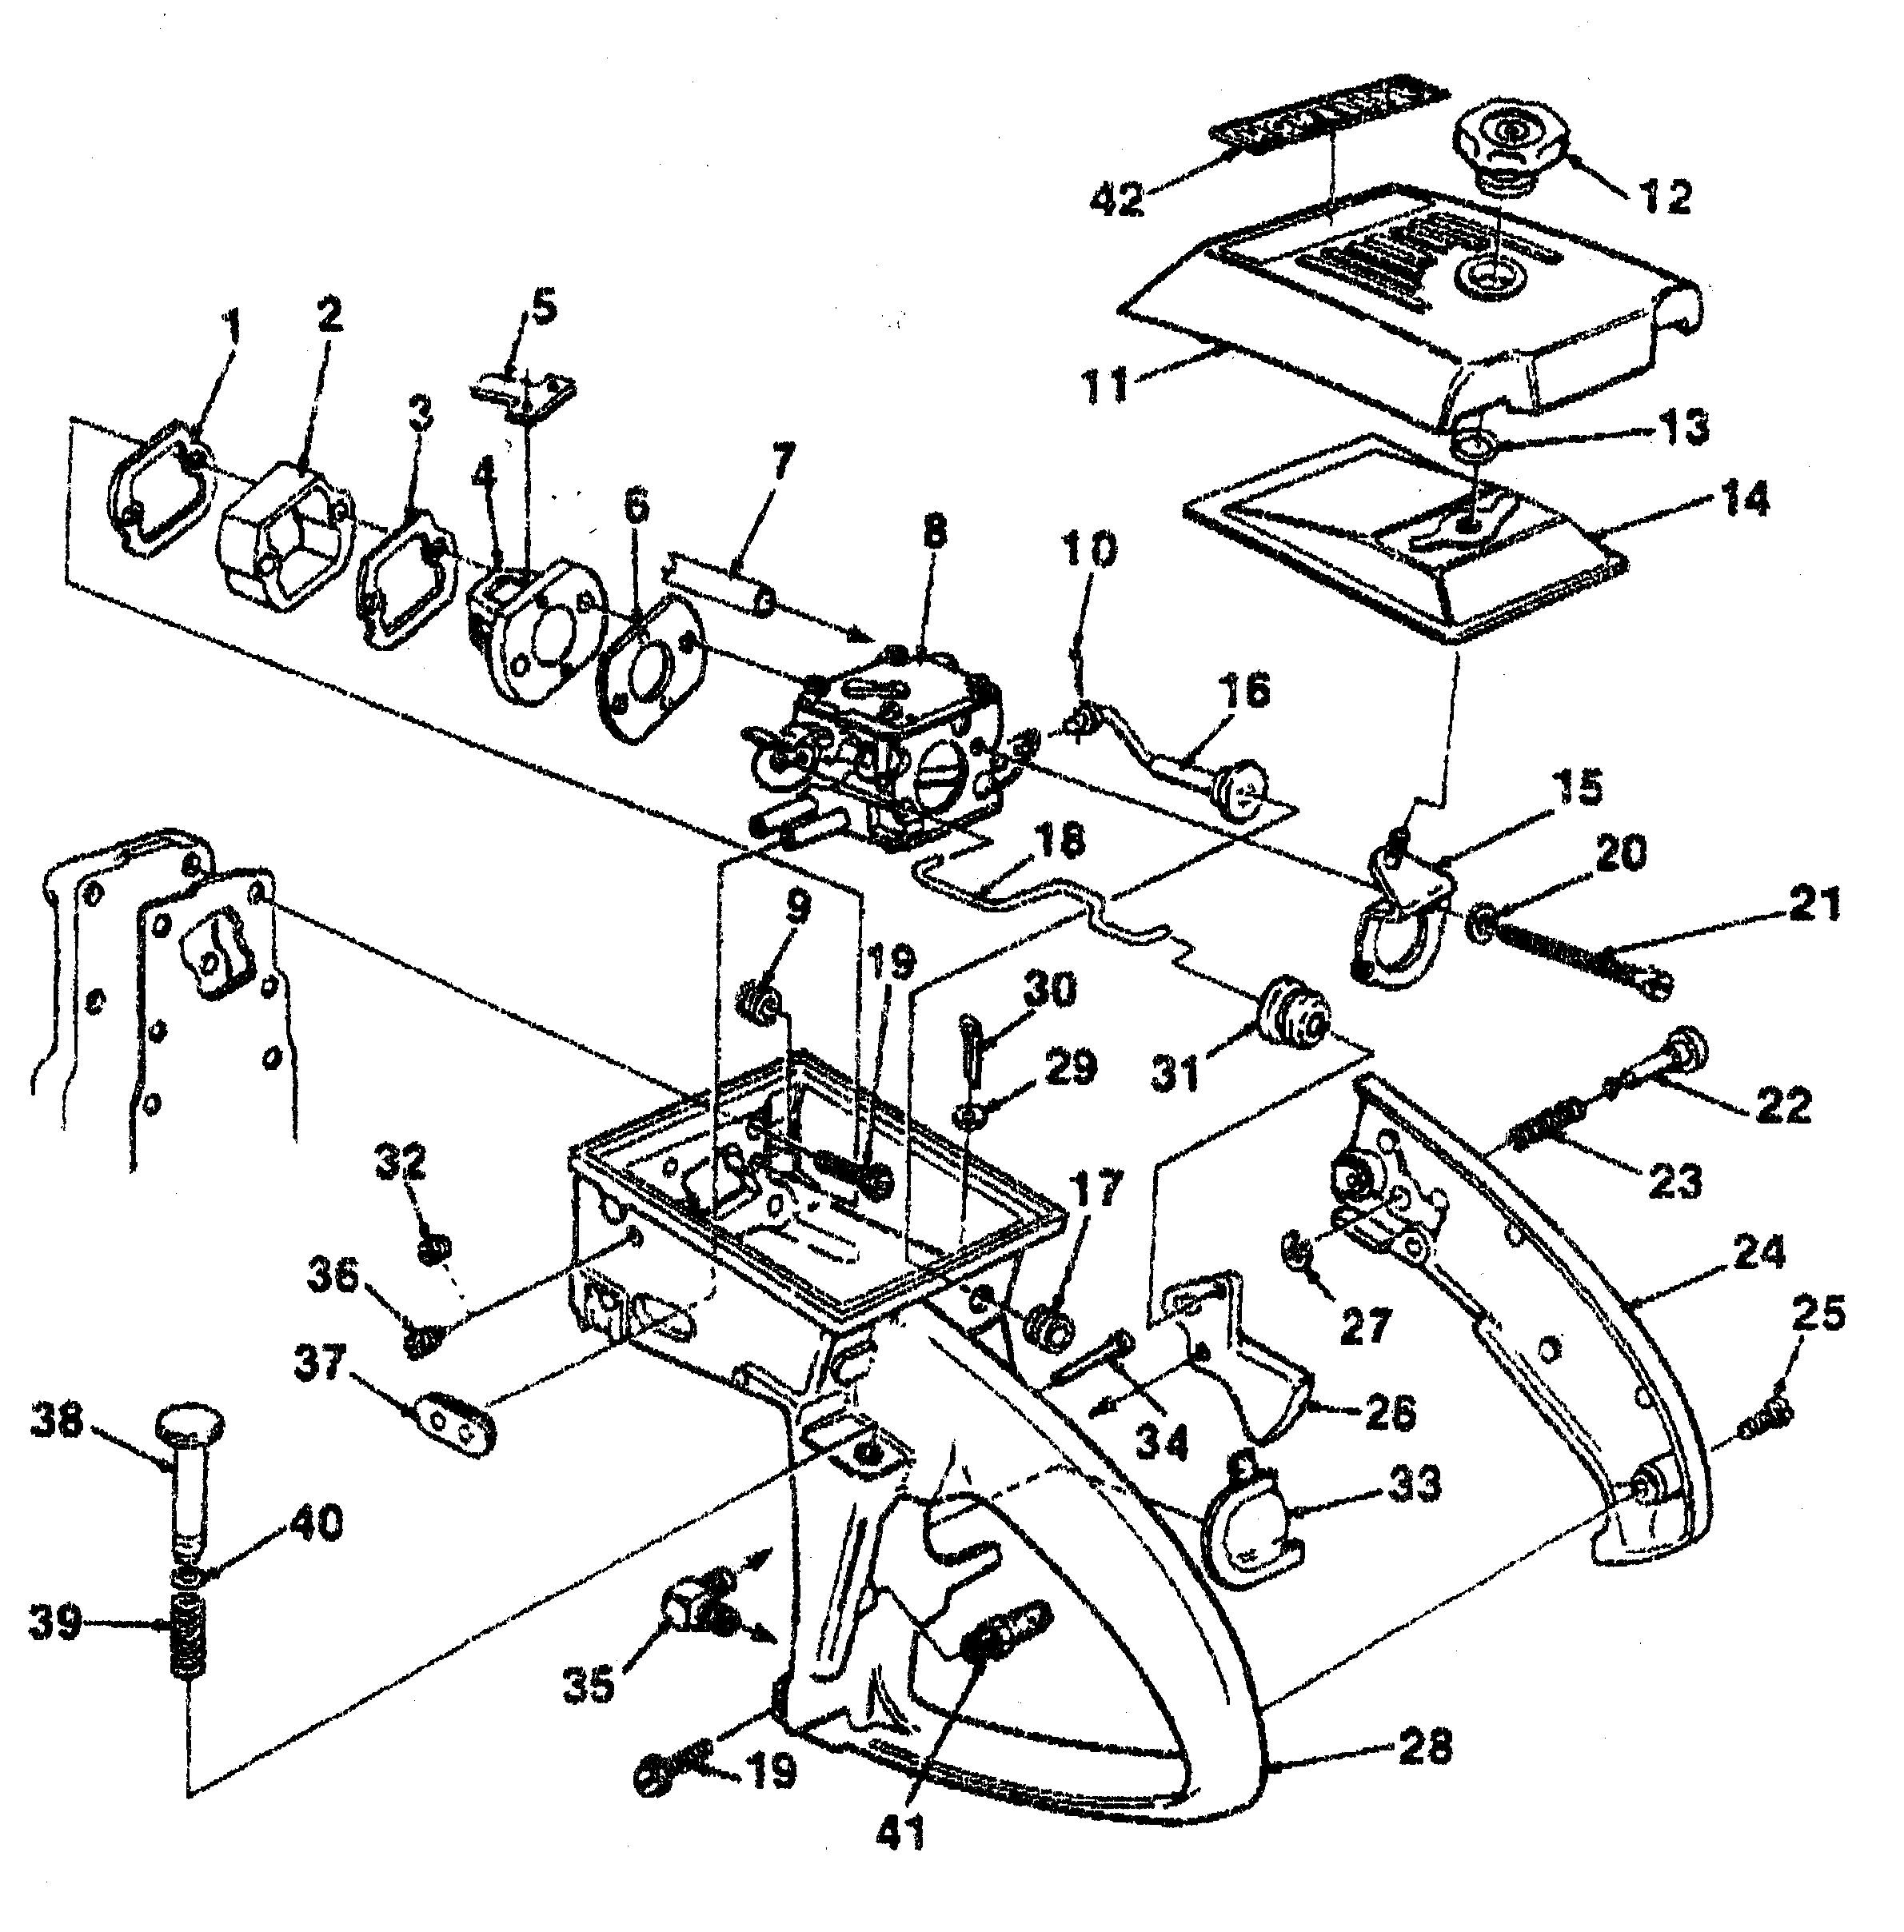 Homelite 360 Chainsaw Parts Diagram Homelite 360 Chainsaw Parts Diagram Homelite Chain Saw Parts Of Homelite 360 Chainsaw Parts Diagram